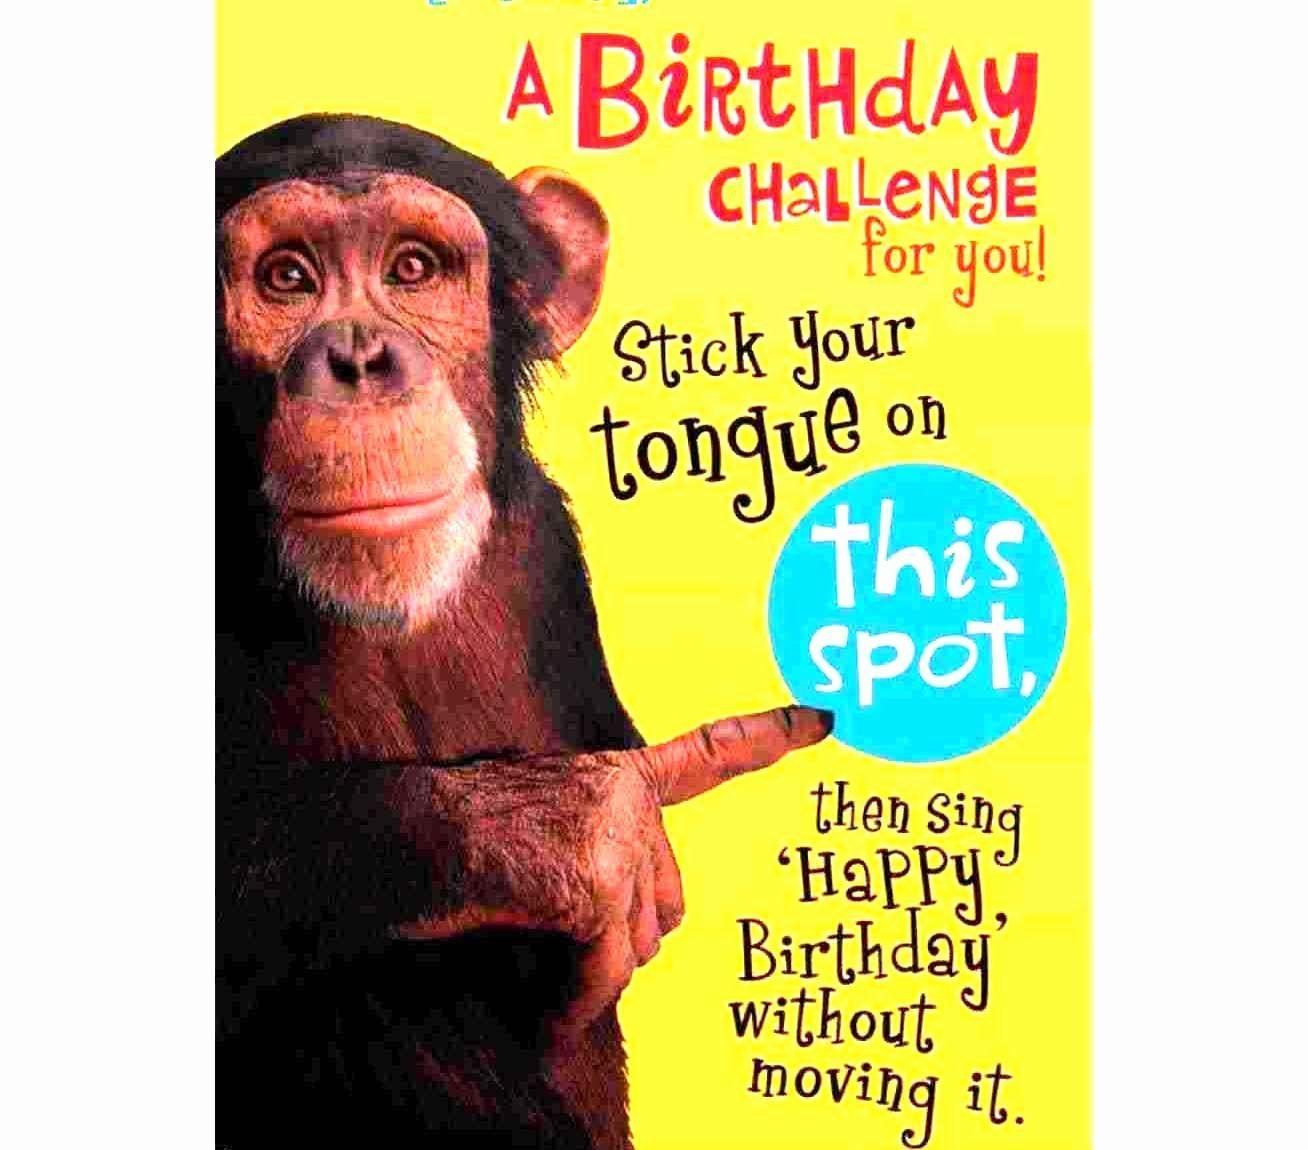 Free Printable Funny Birthday Cards Inspirational Free Printable Funny Birthday Car Funny Printable Birthday Cards Funny Birthday Cards Birthday Card Printable